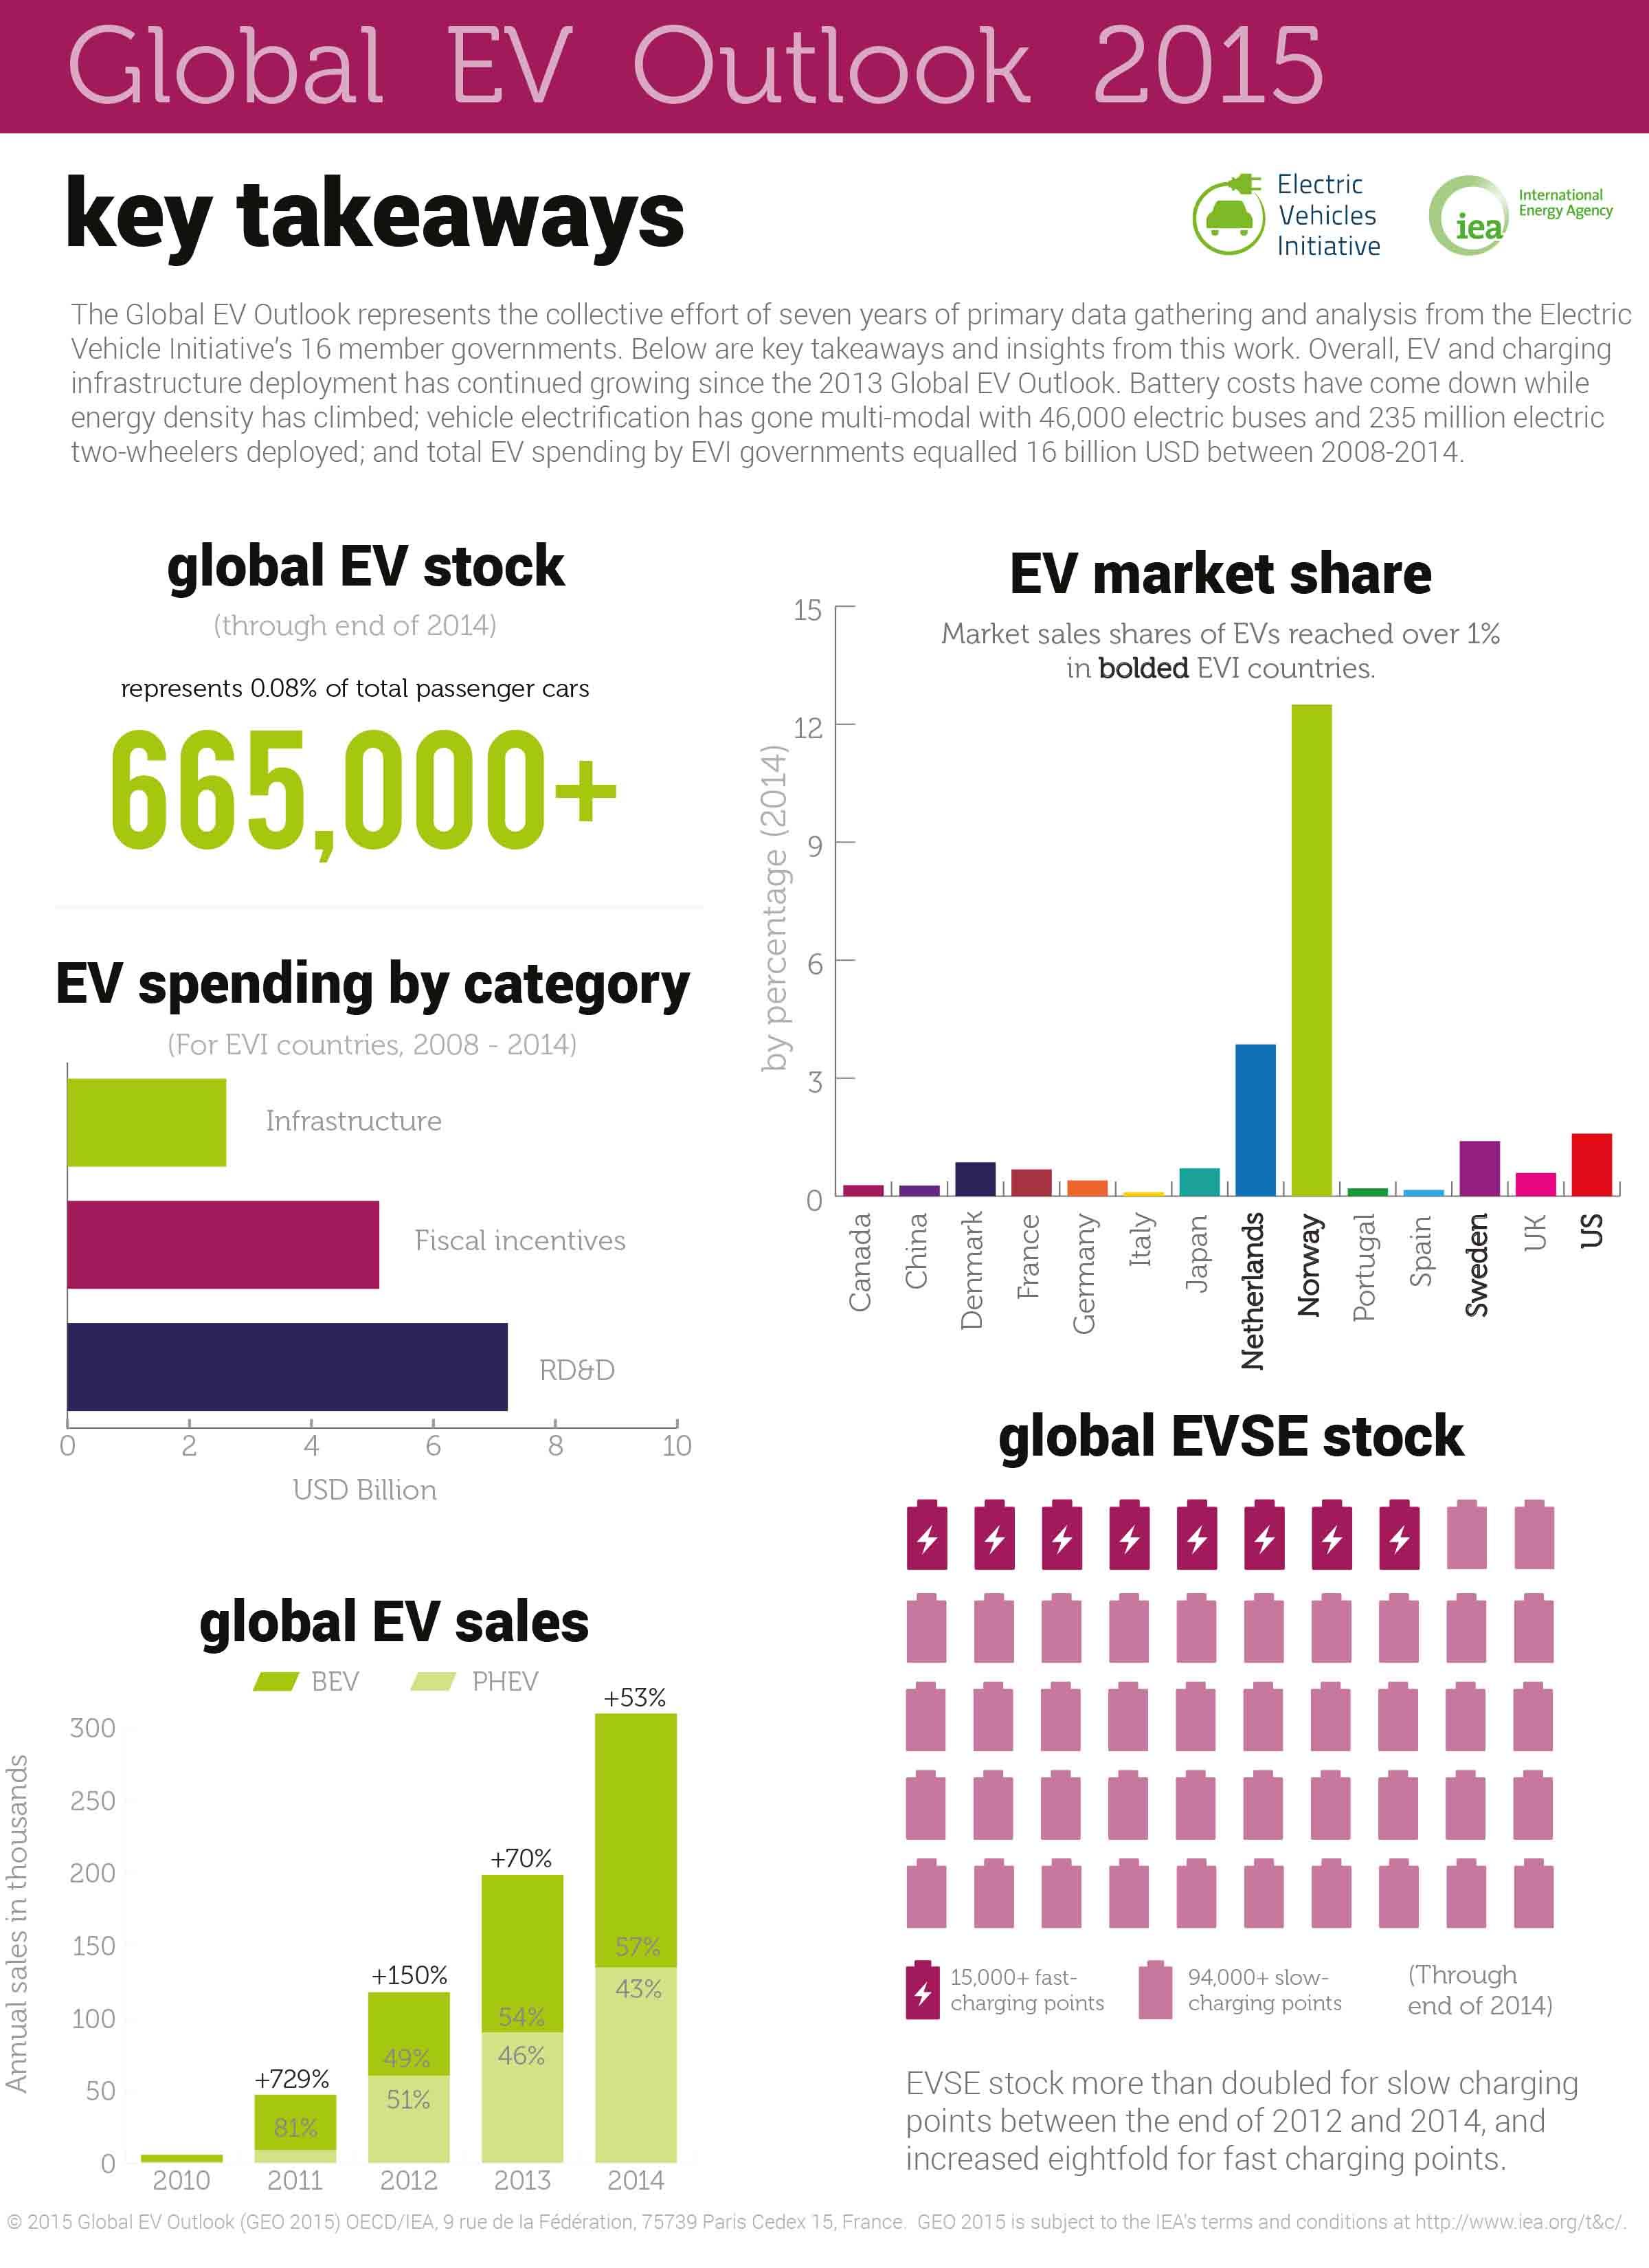 blogg-20150603-global EV 1 800